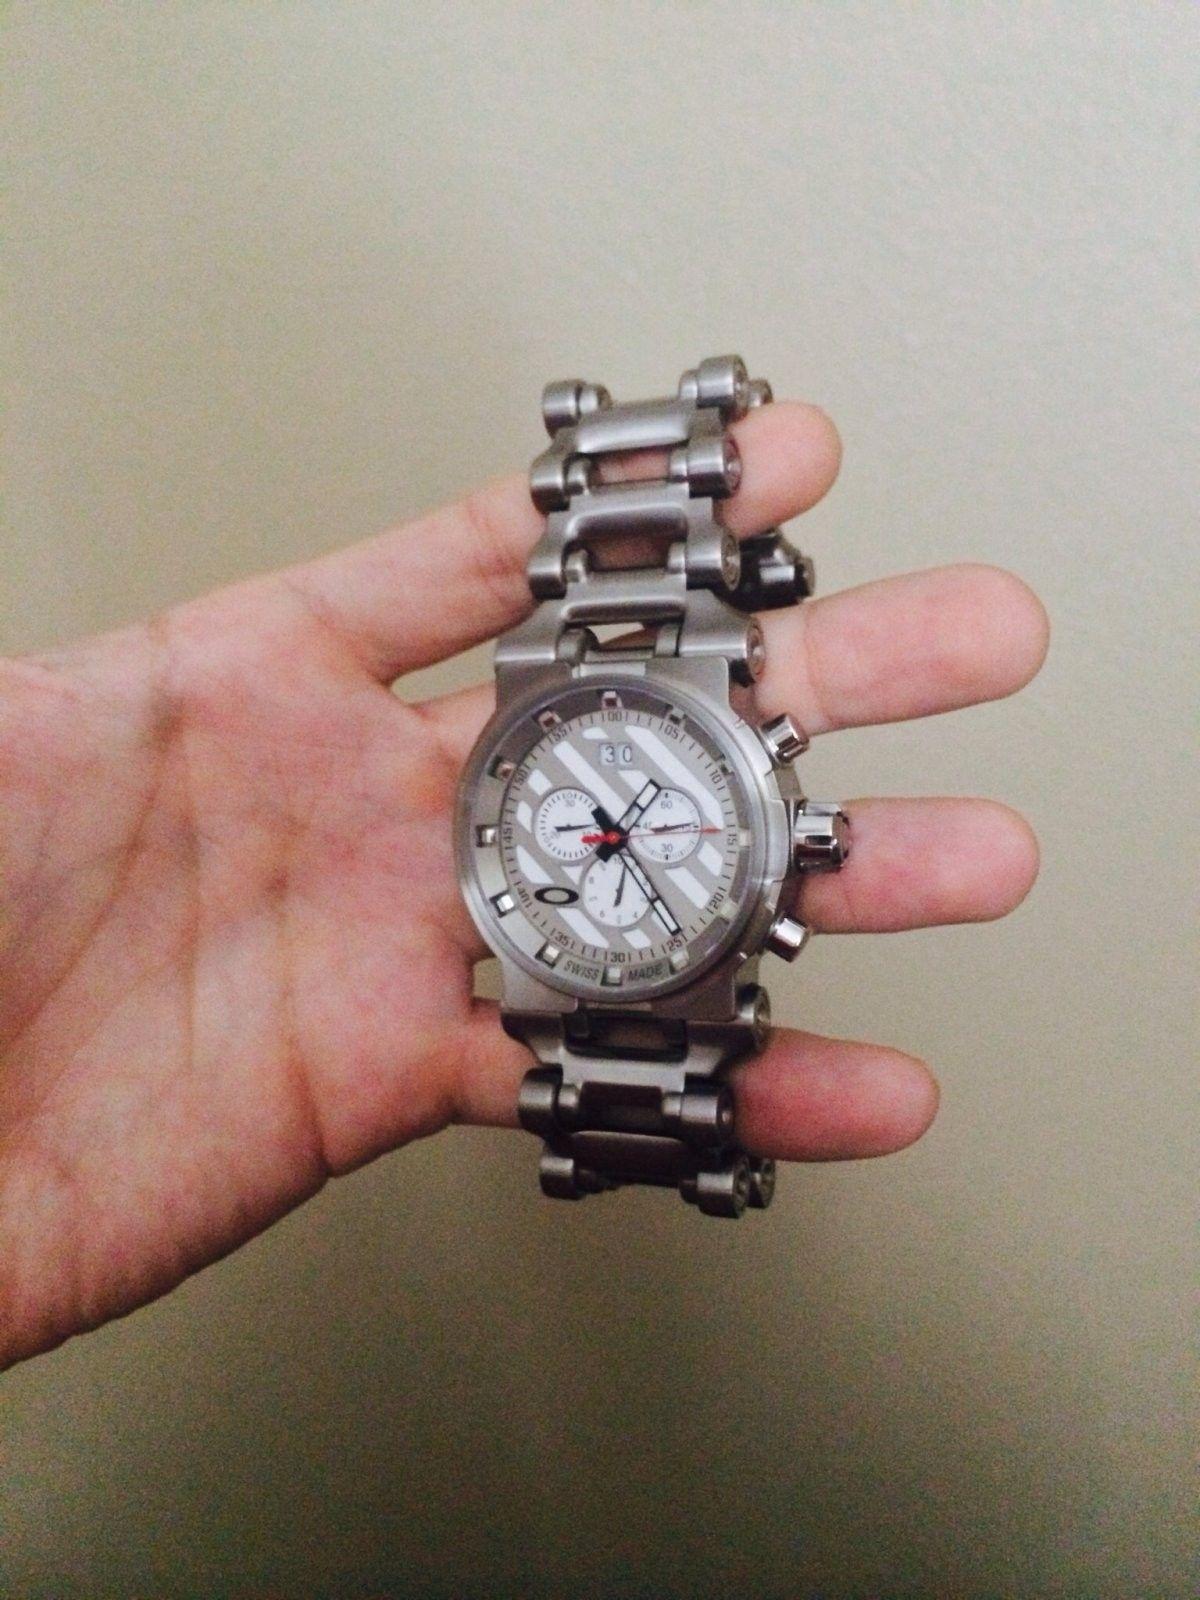 New Watch - image.jpg